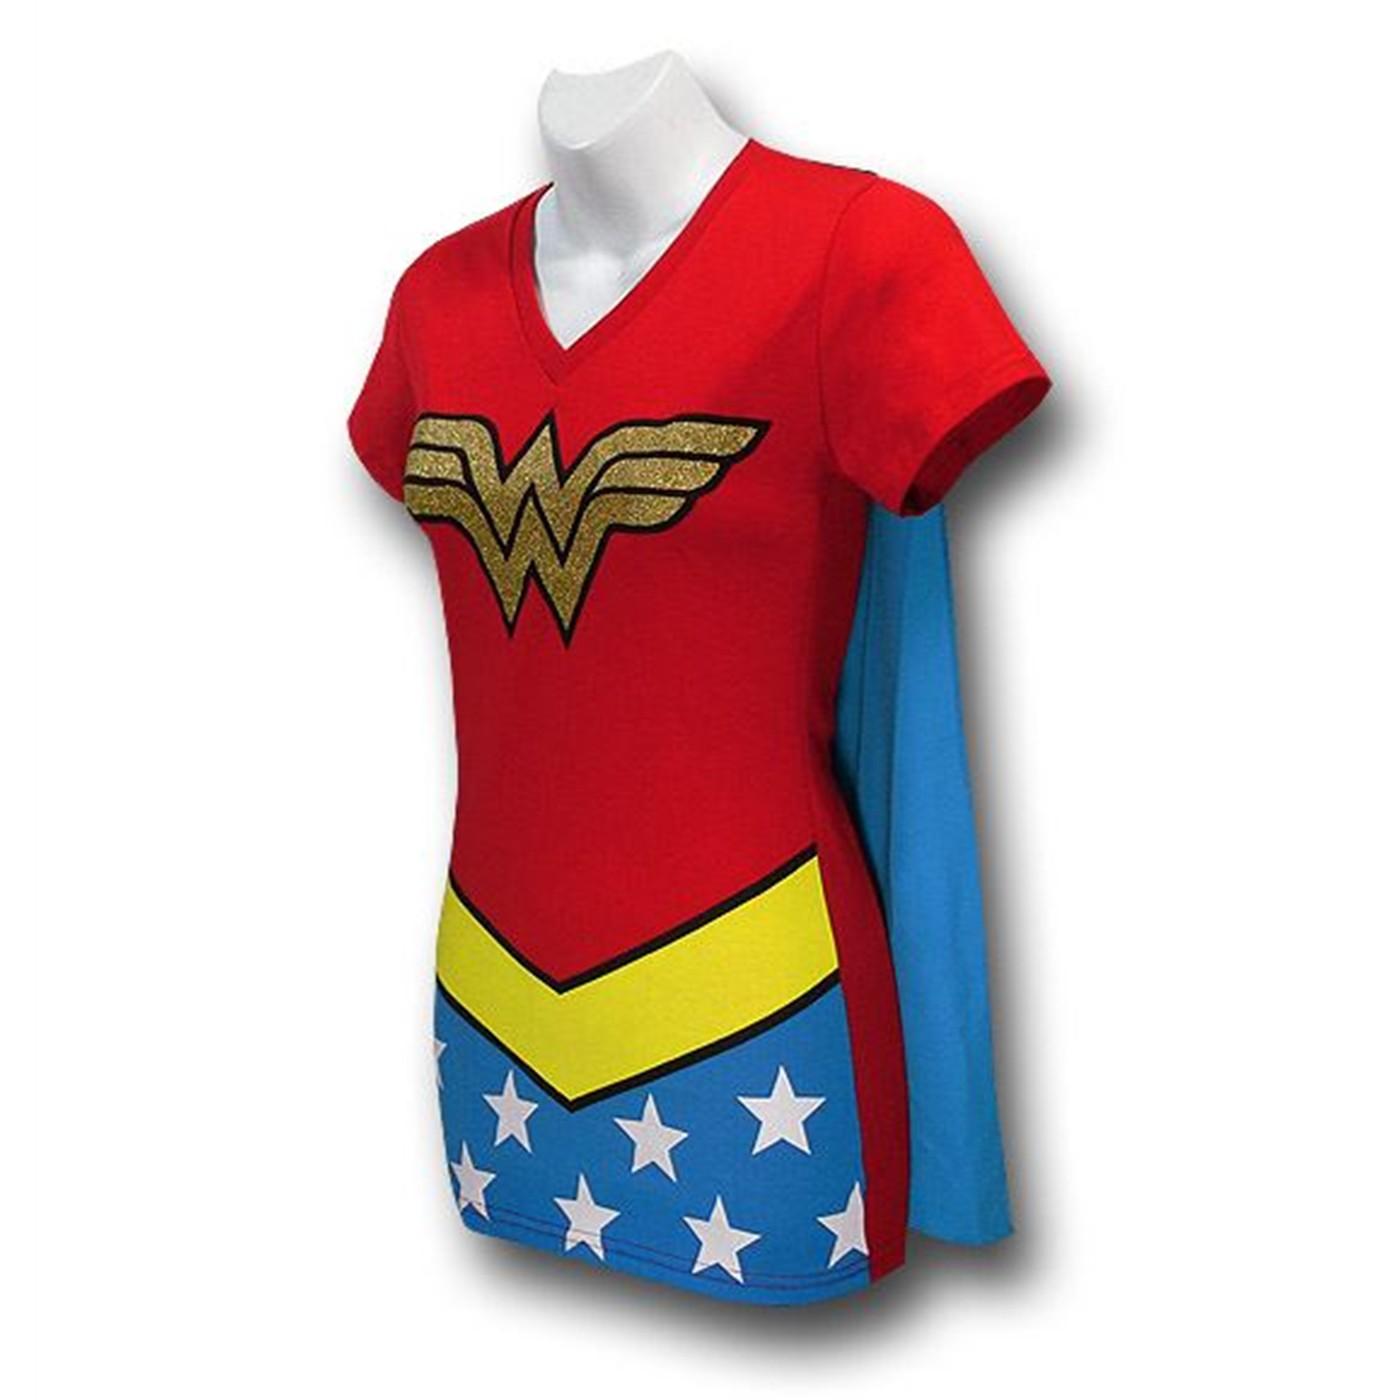 Wonder Woman Women's V-Neck Caped Costume T-Shirt